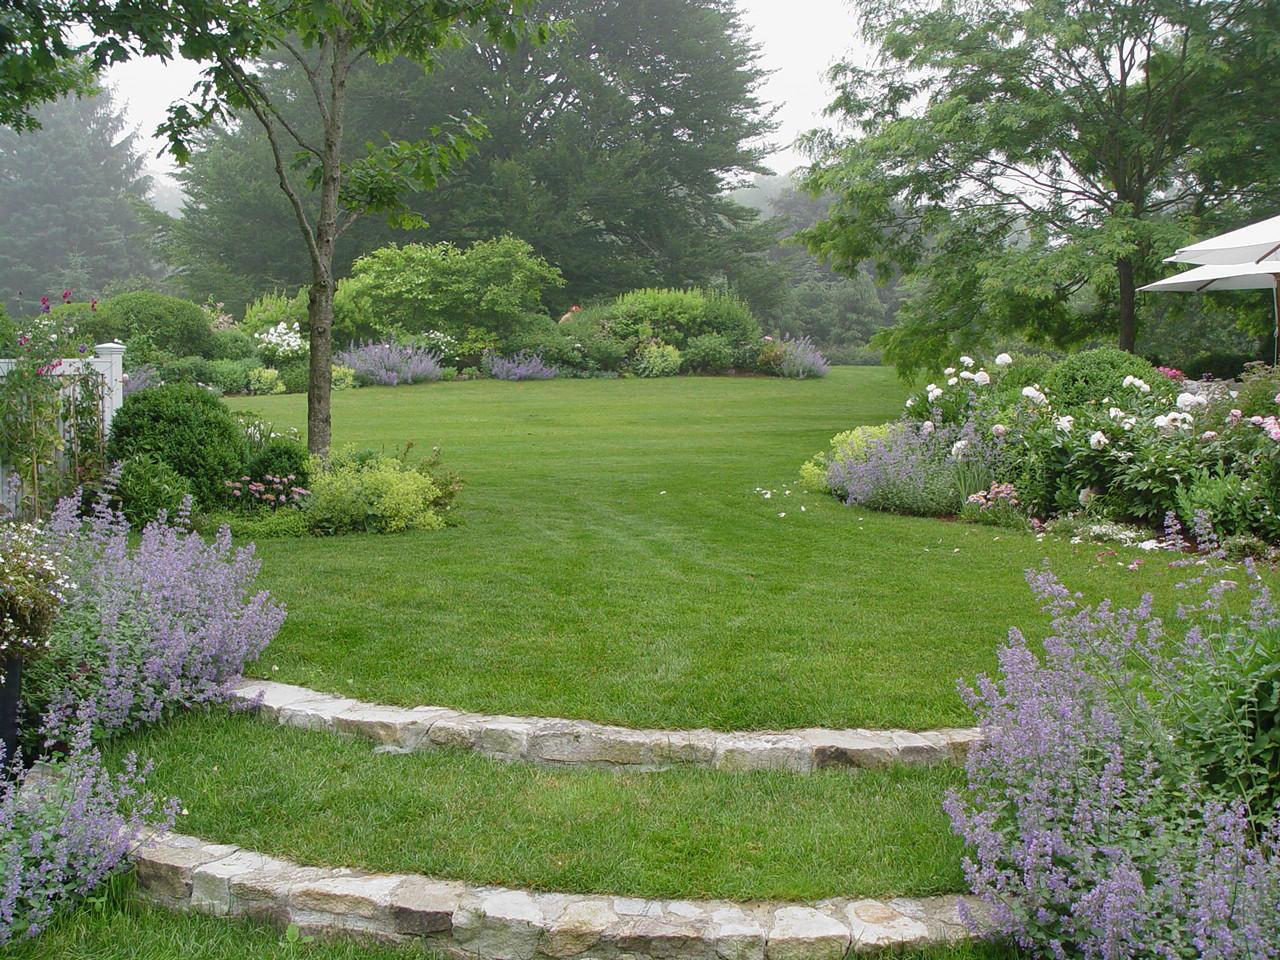 landscaping-design-ideas-around-the-house-landscape-design-ideas-garden-image-decoration-designs-idea-image